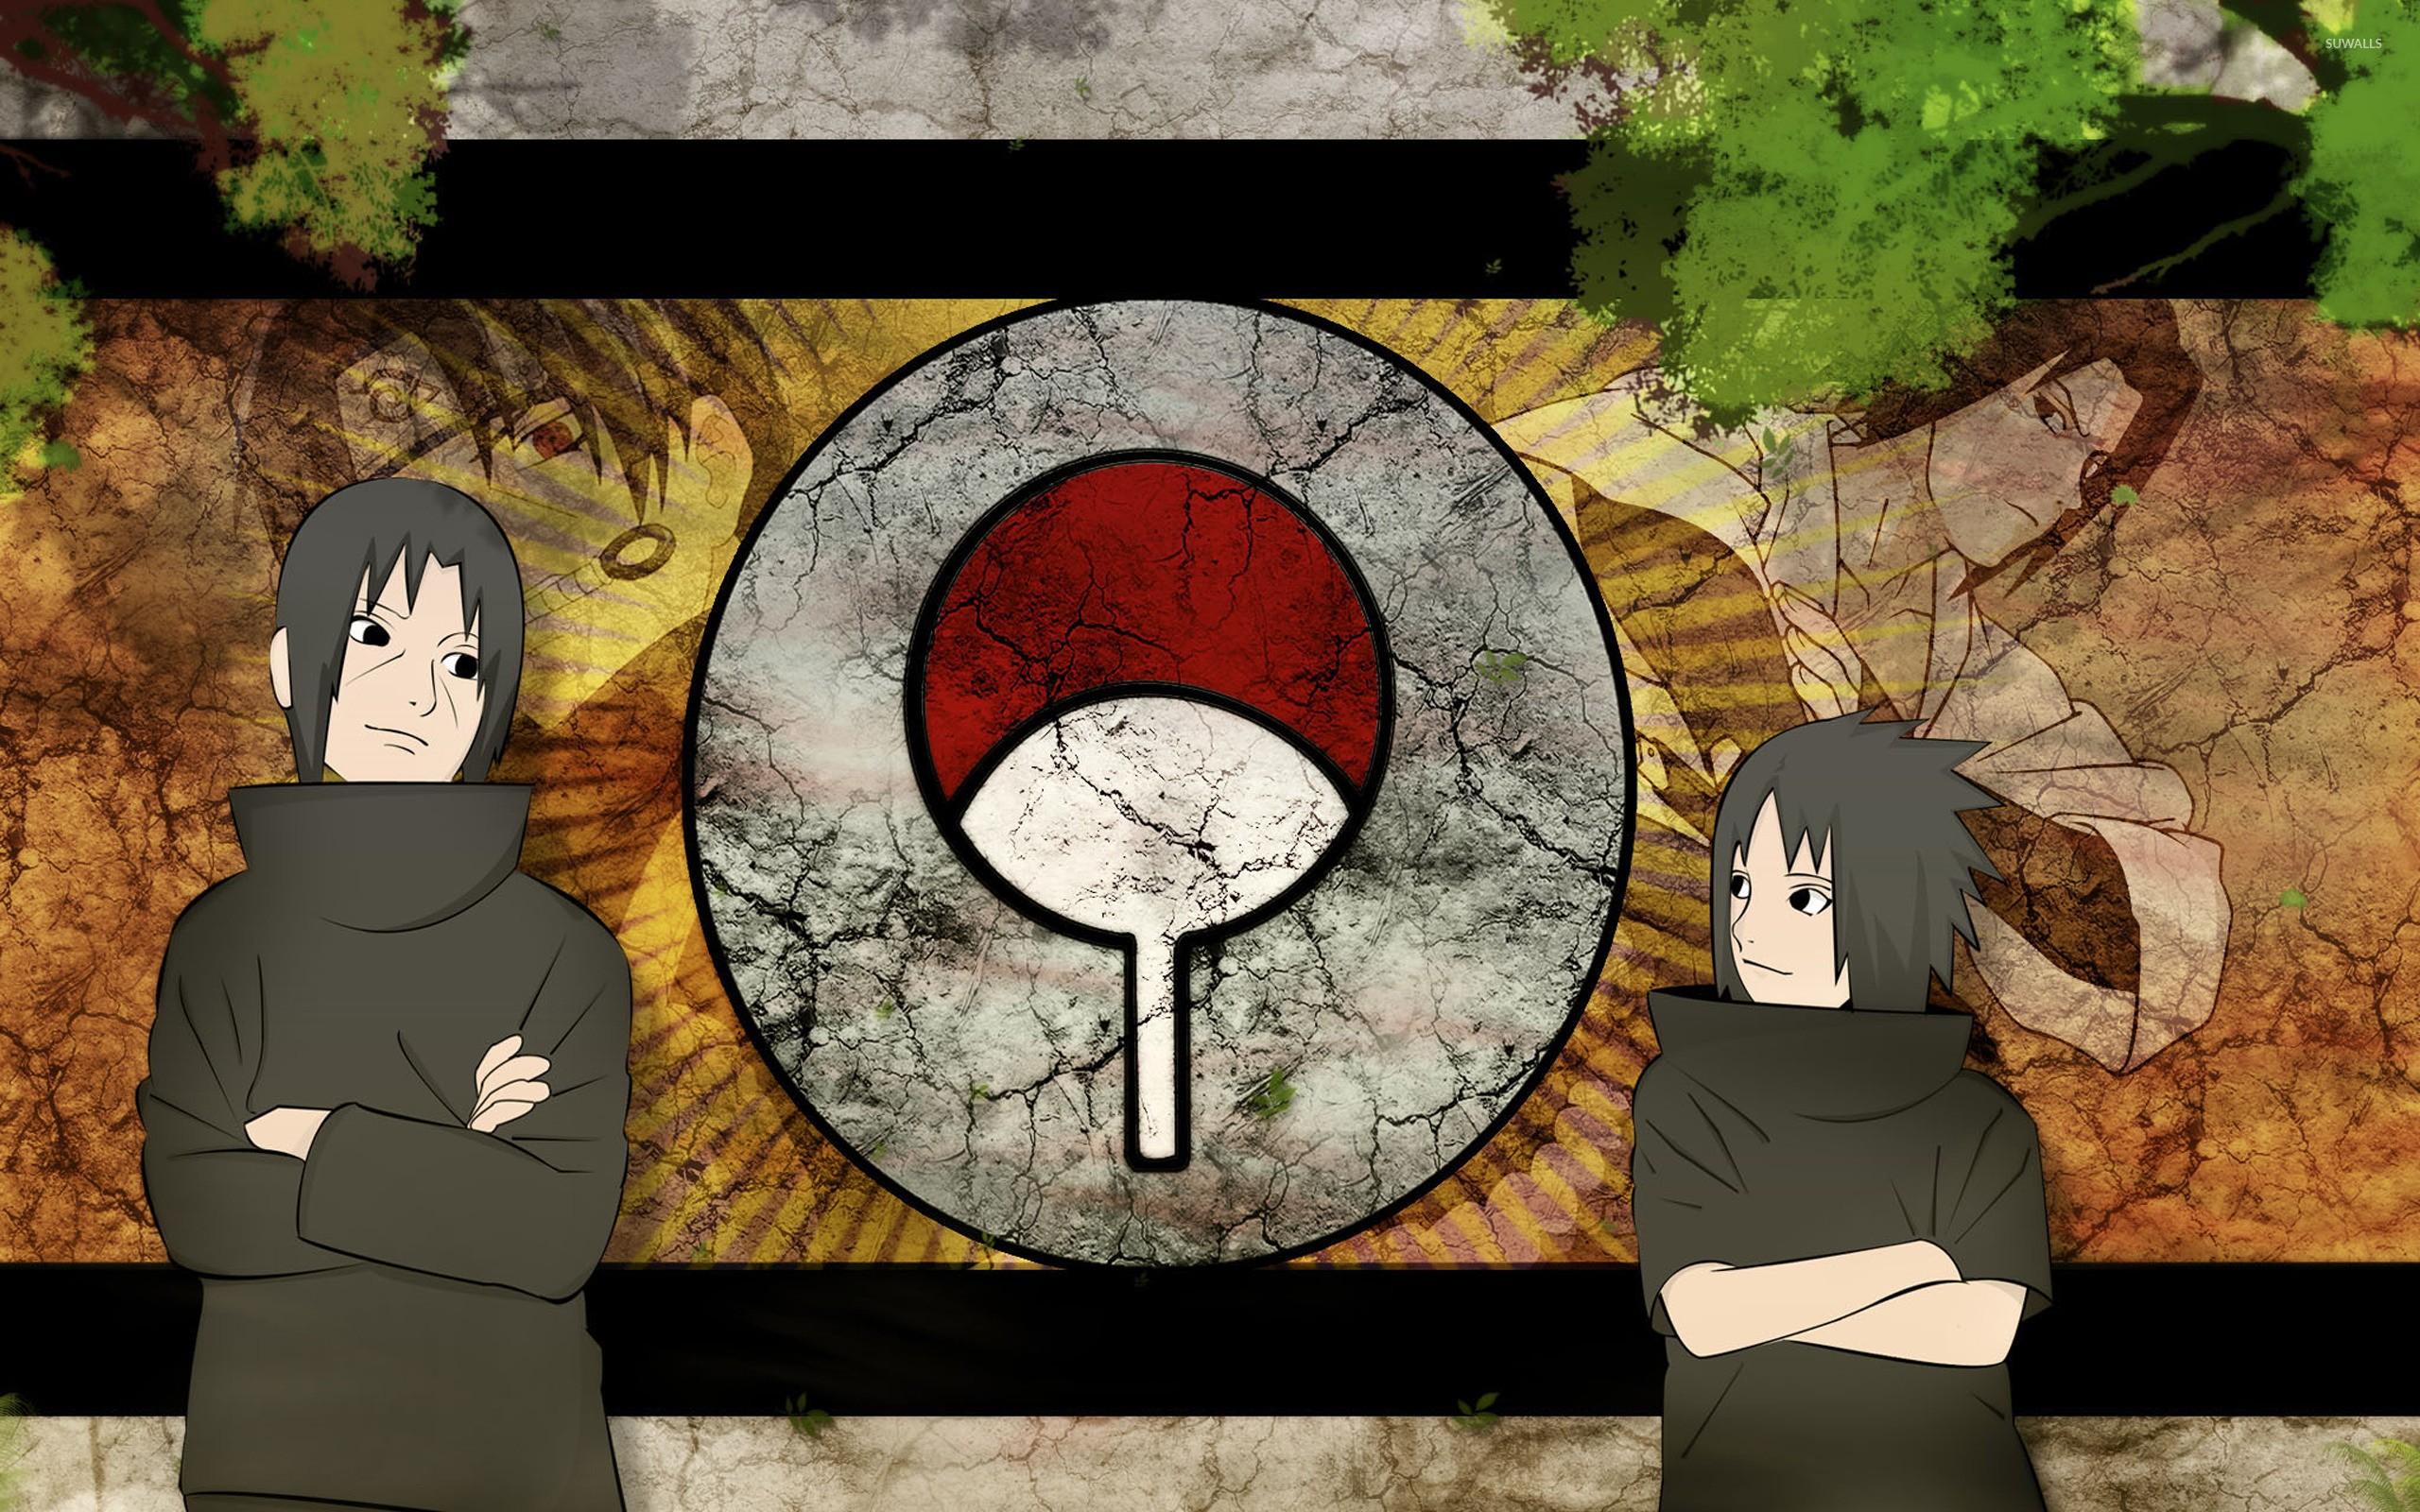 Itachi Uchiha wallpaper ·① Download free awesome ...